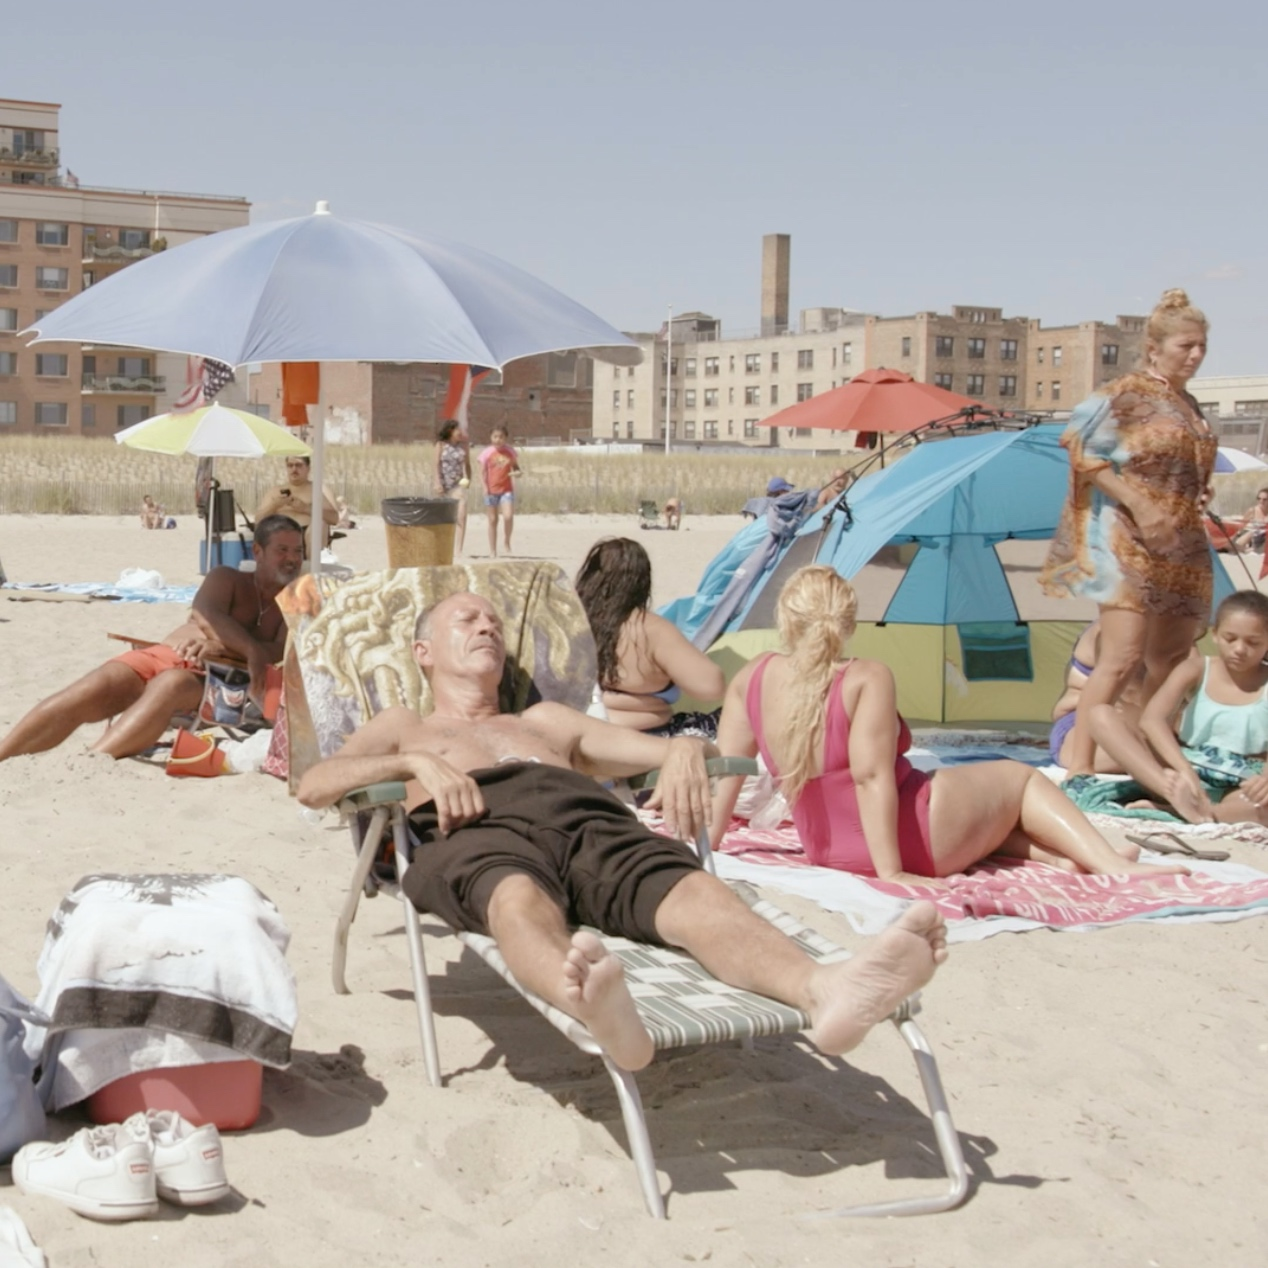 THA_couple+on+beach+edit.jpg